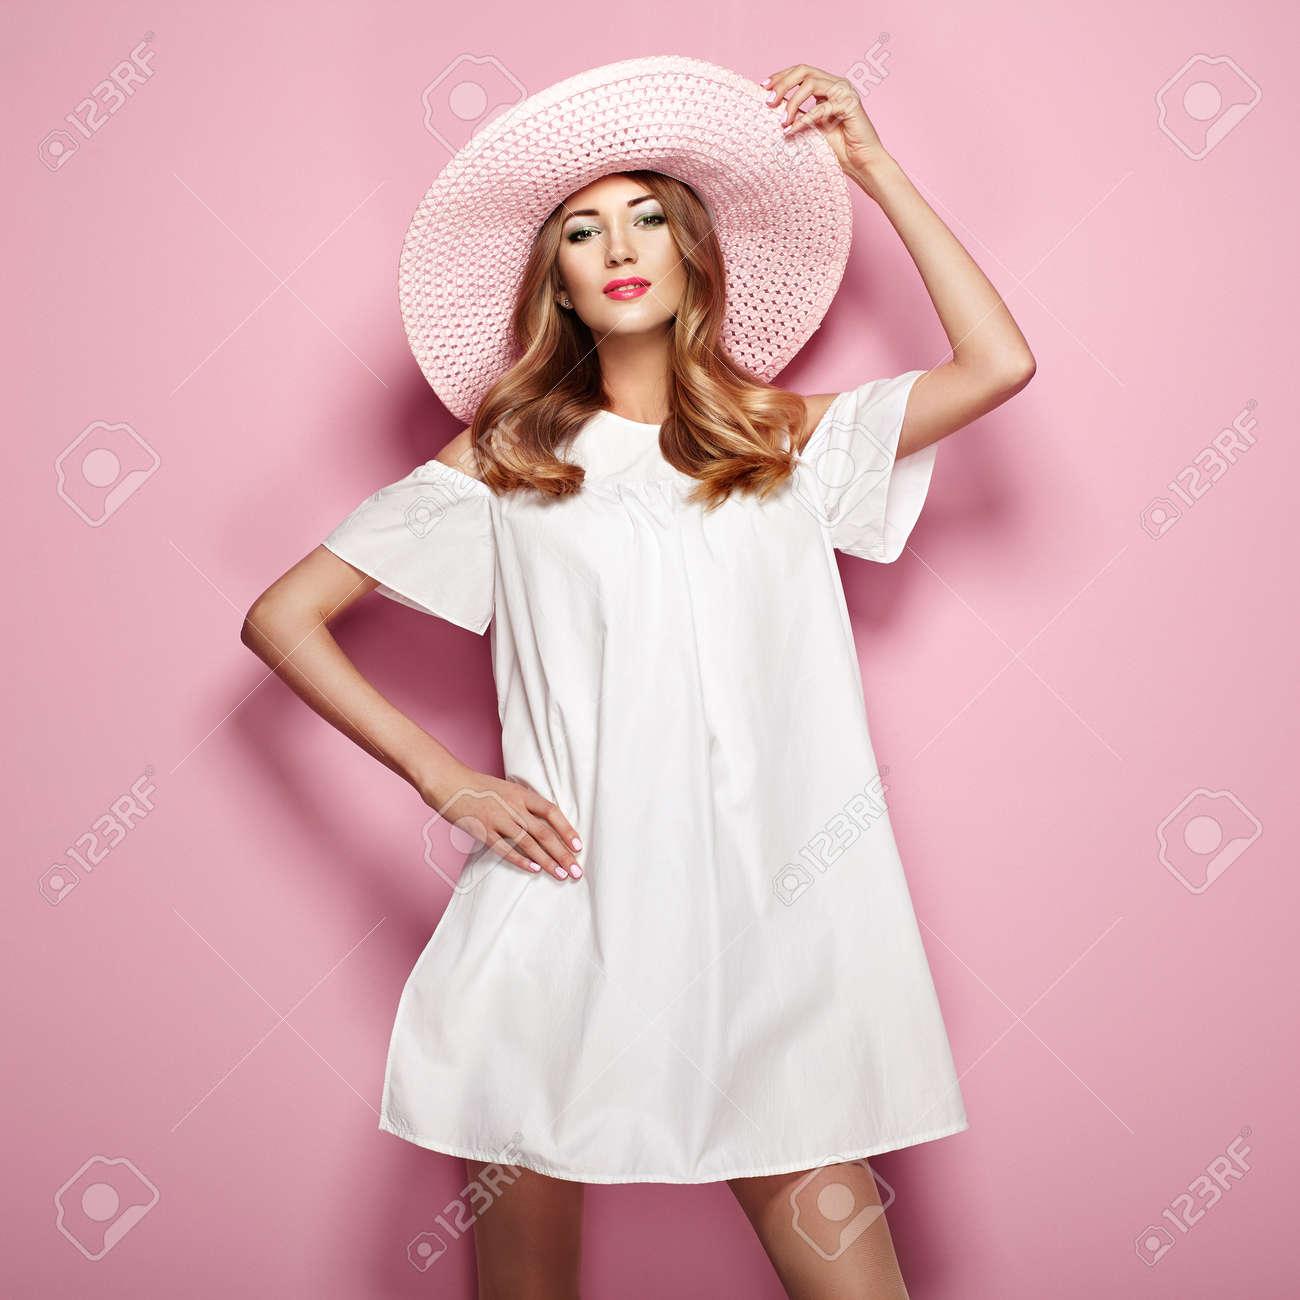 Rosa kleid welcher schmuck